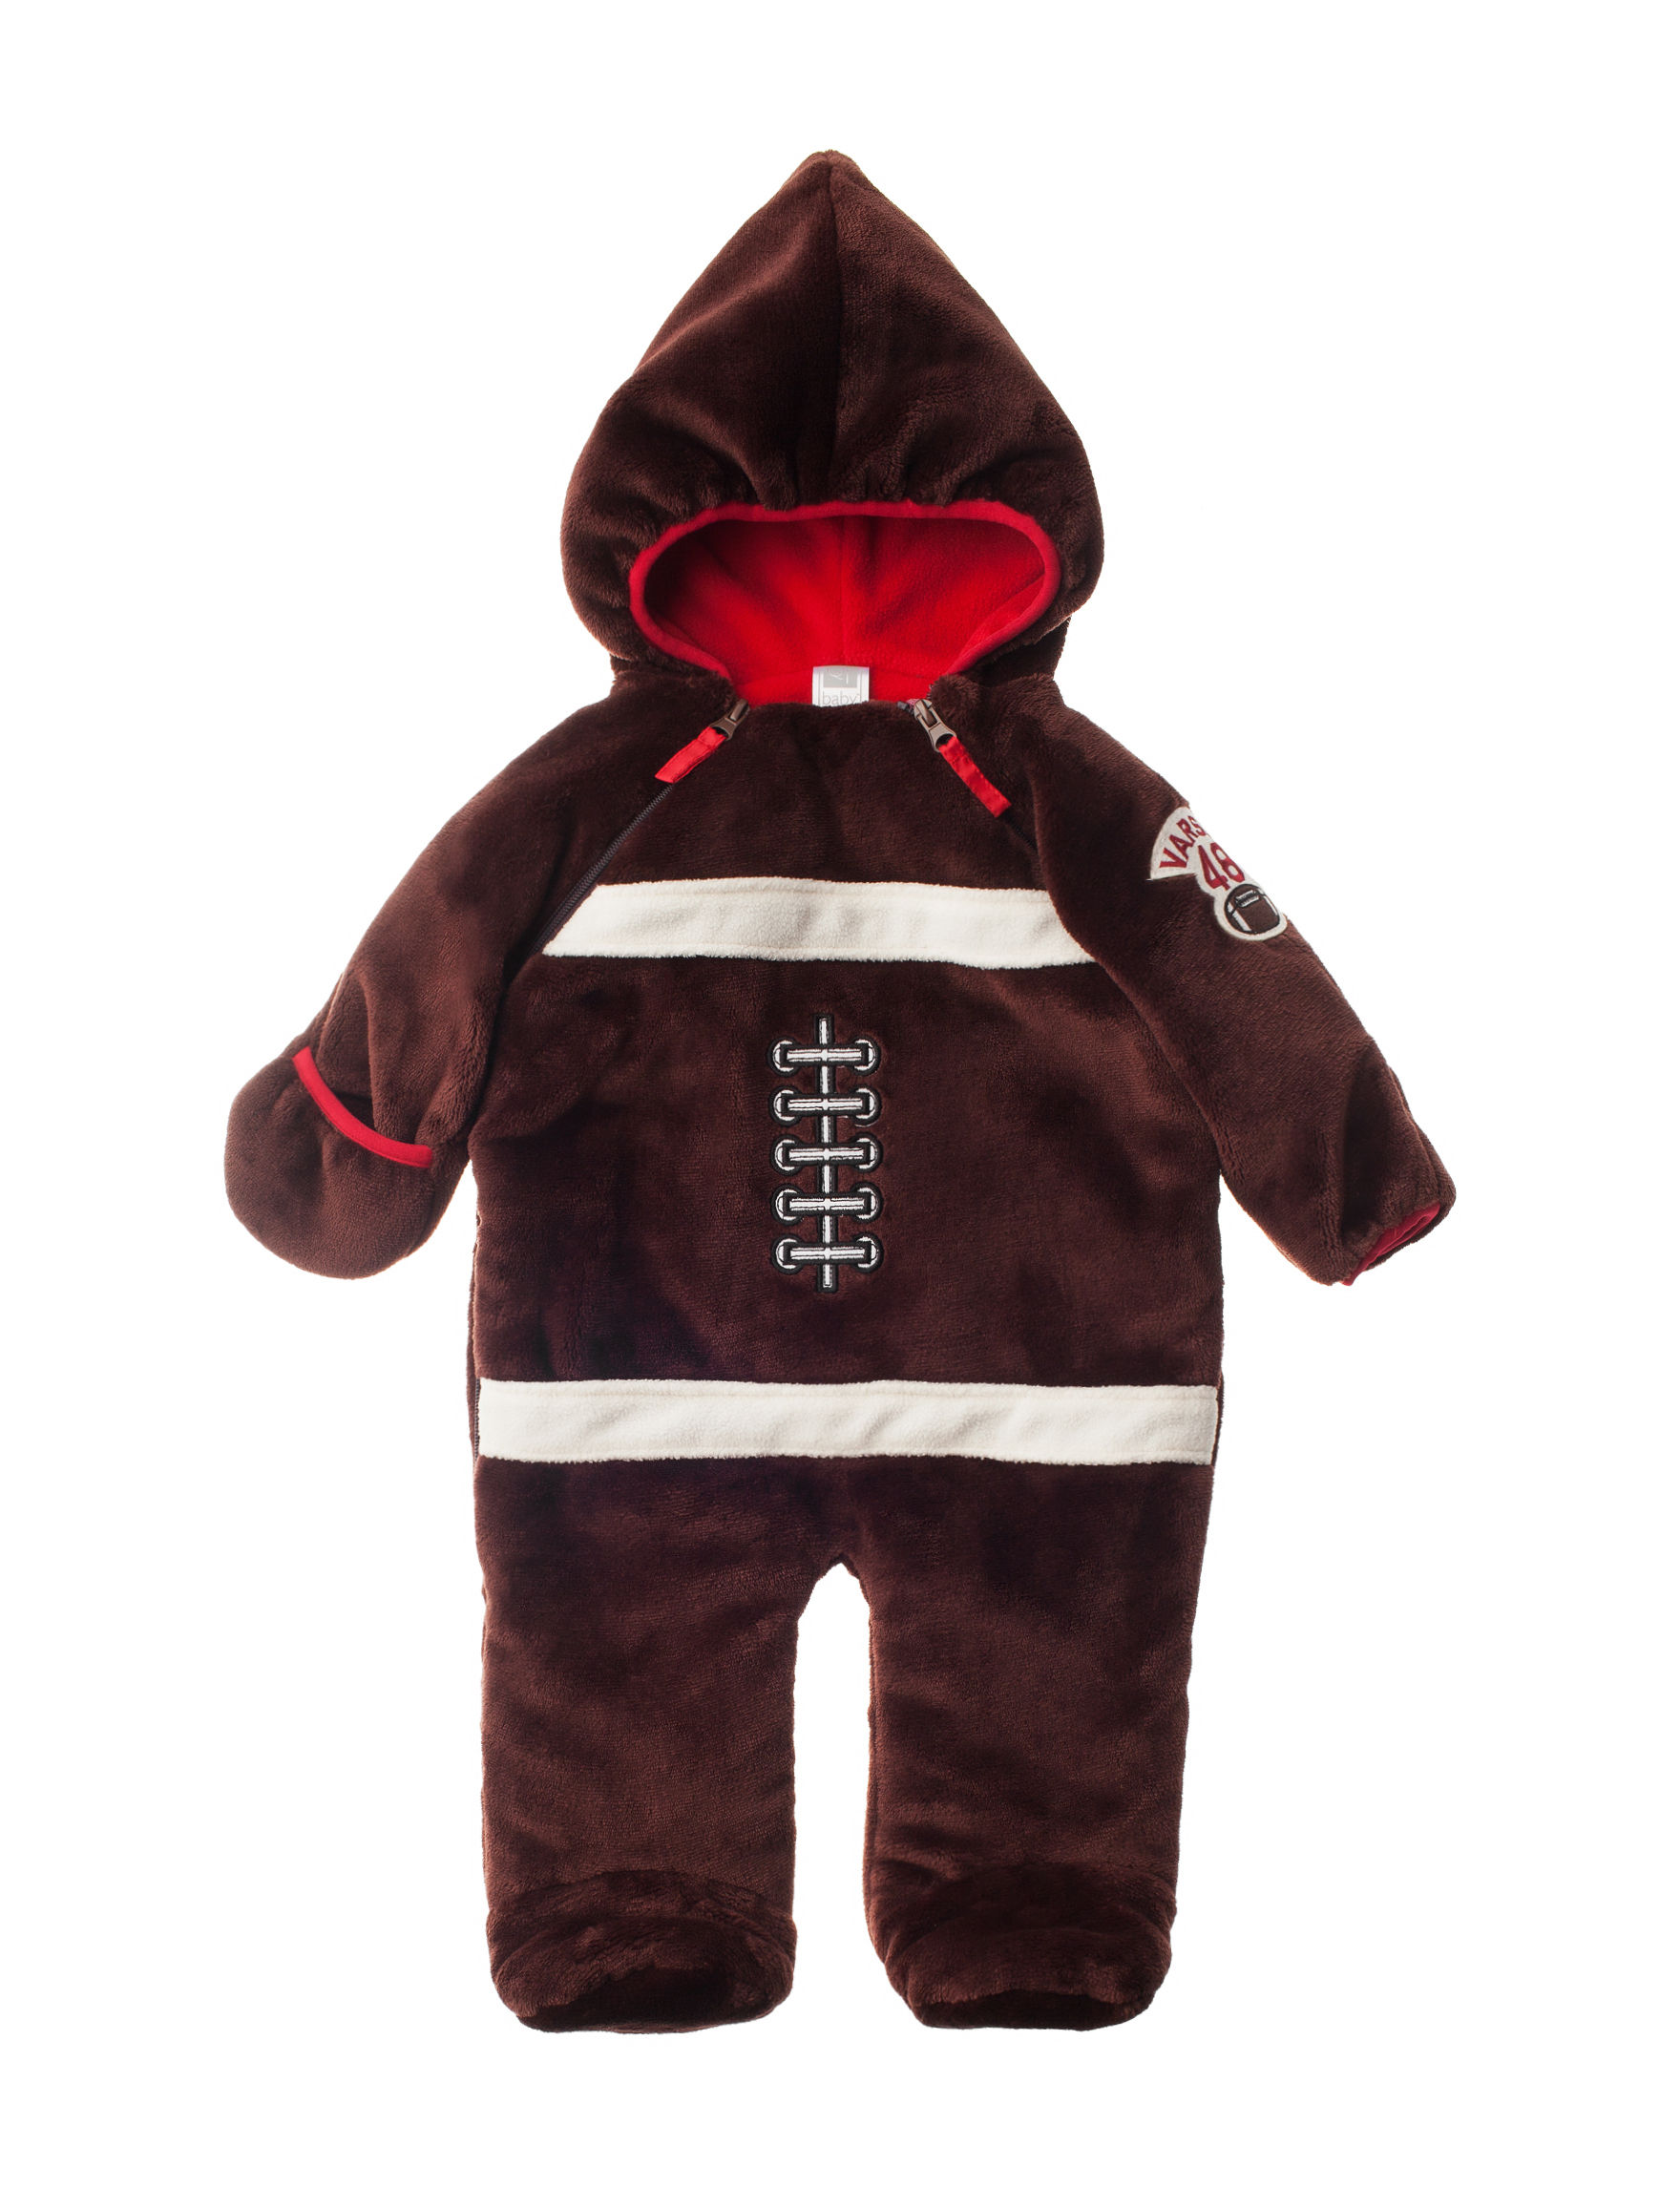 QT Baby Chocolate